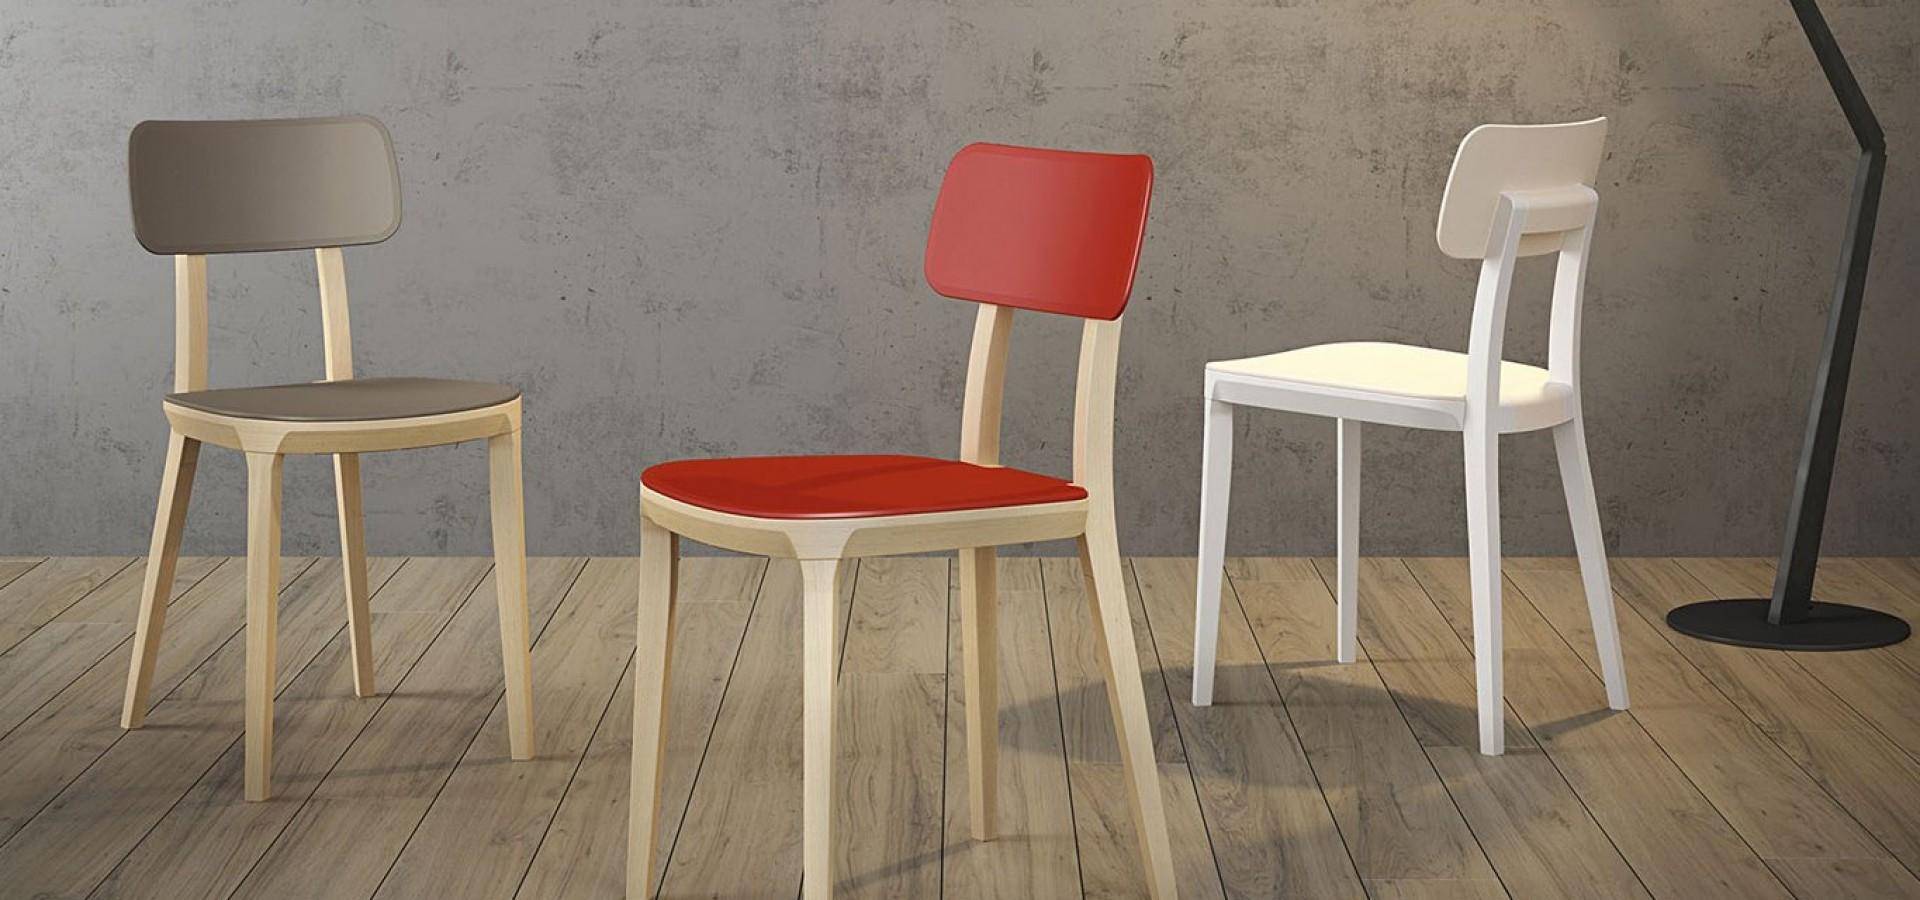 Итальянский стул Стул Alicia | Стул Стул Alicia ARREDO3